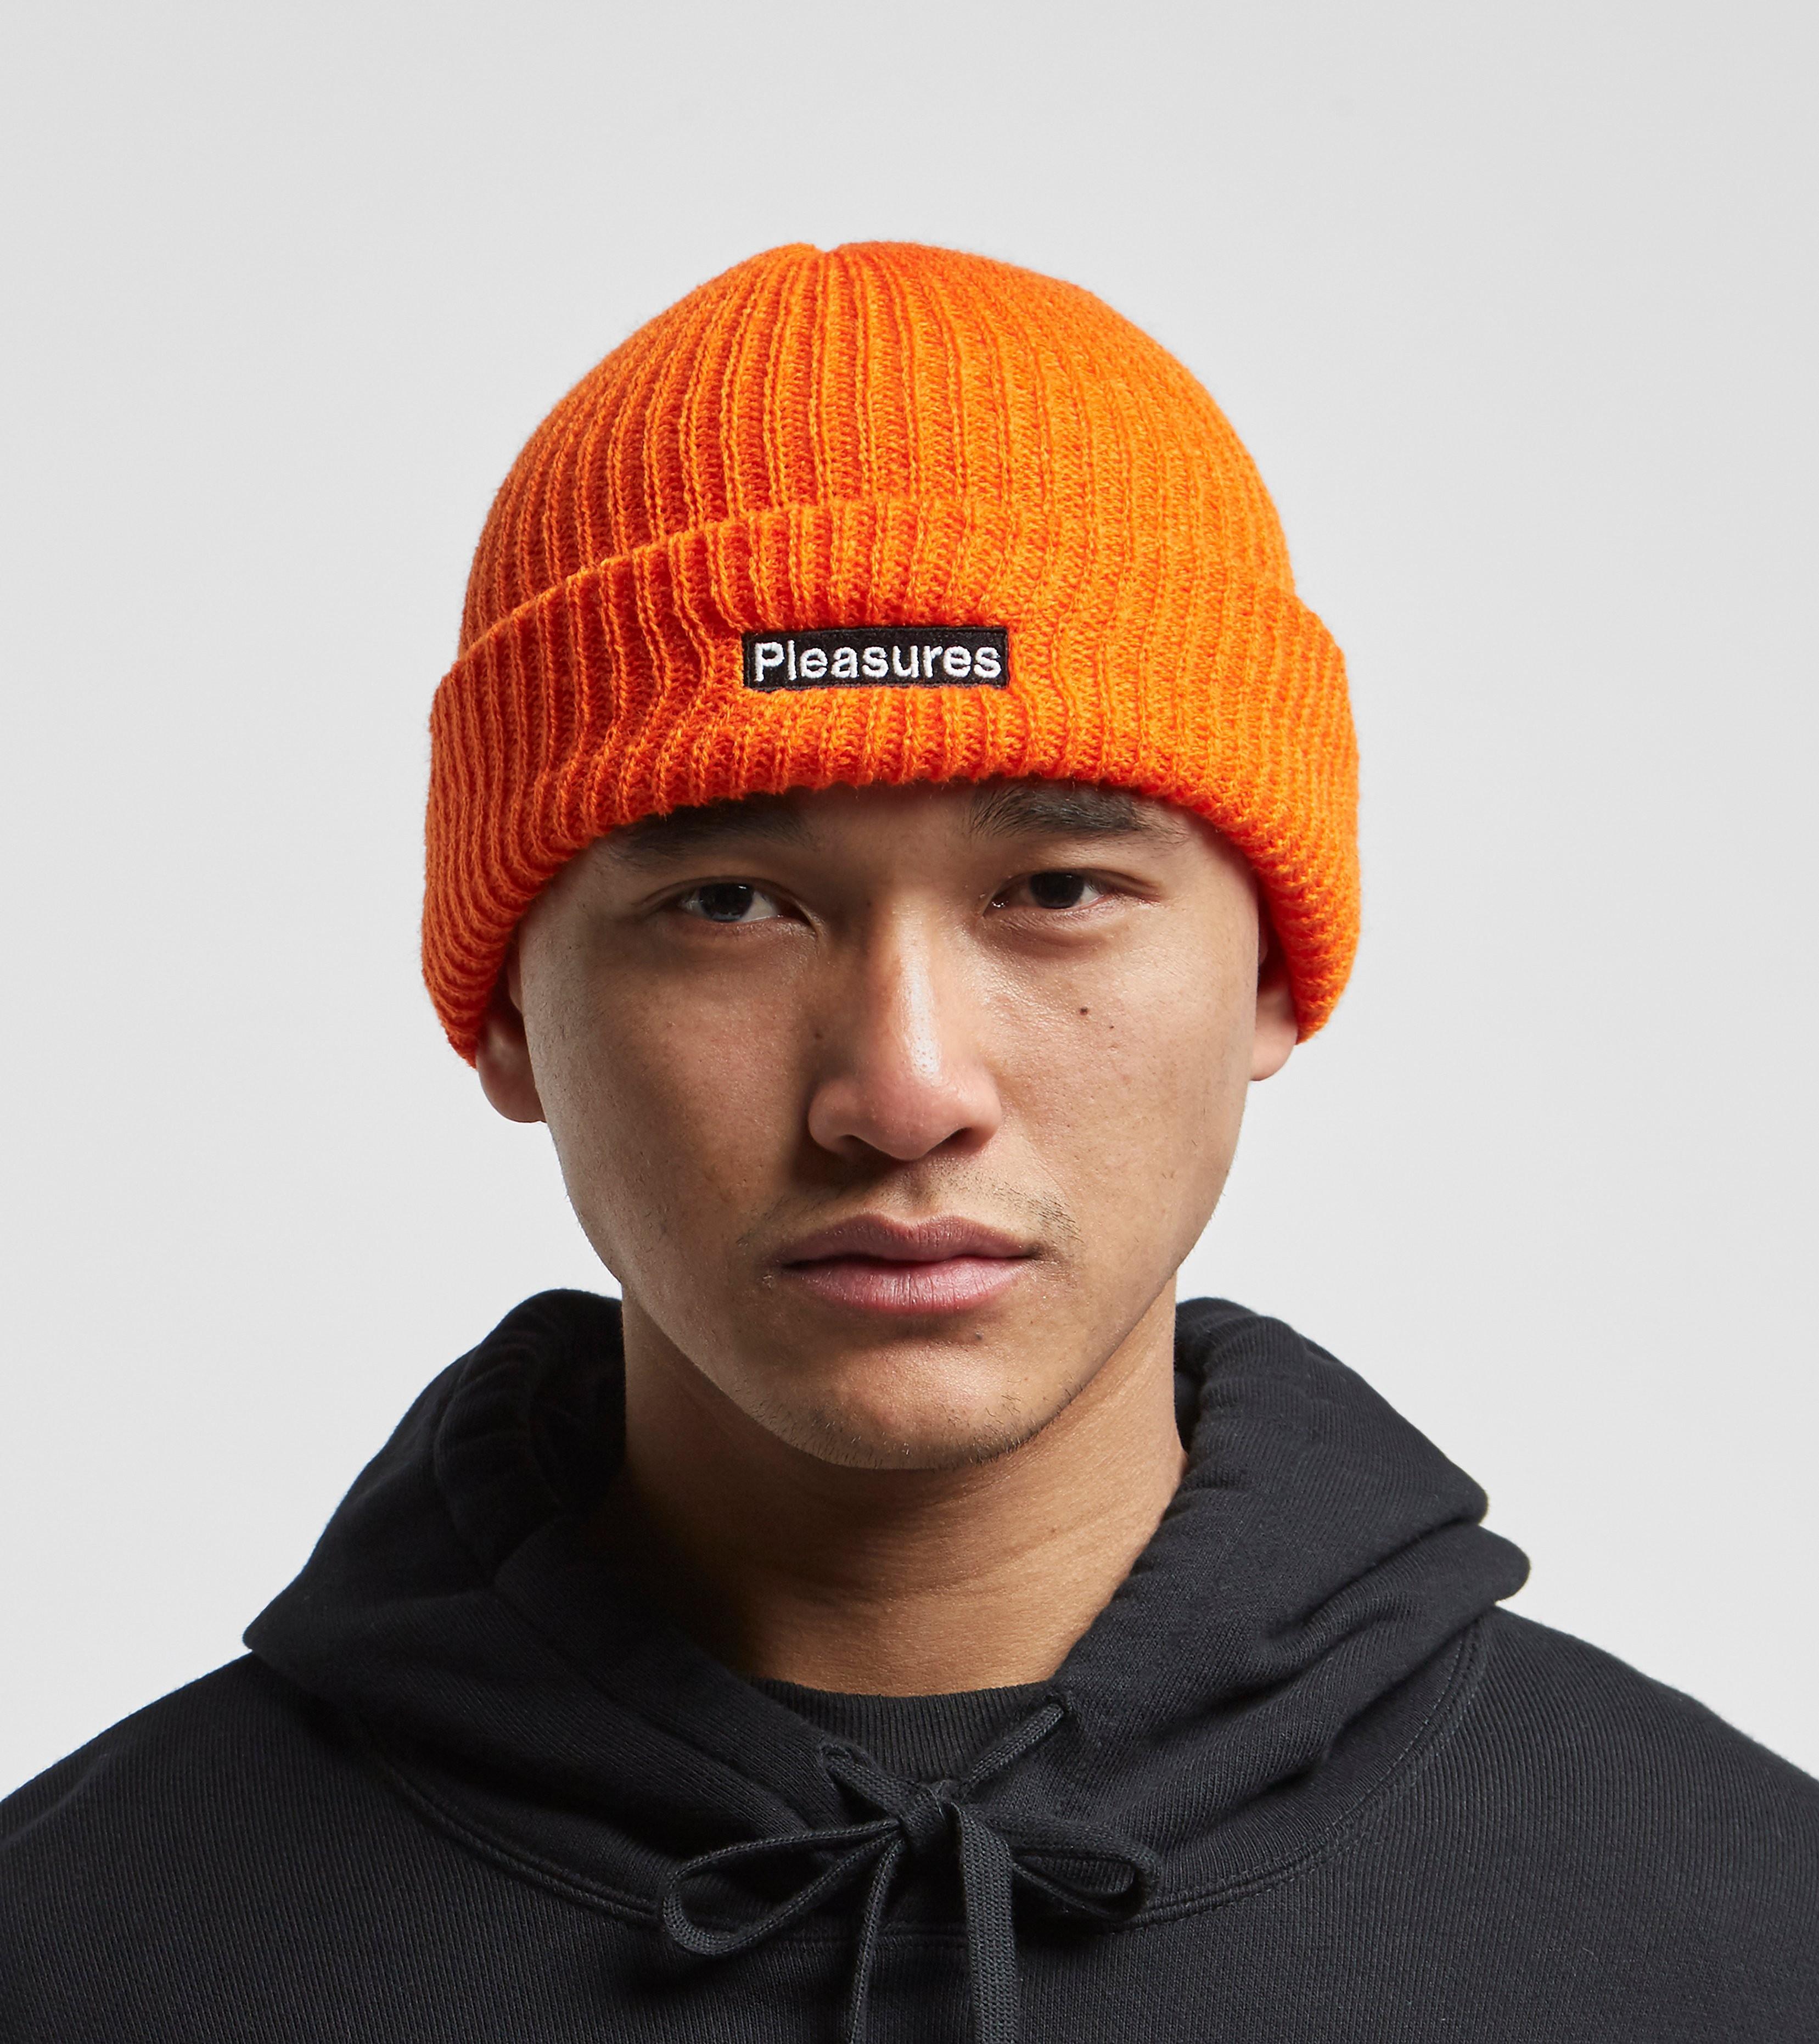 PLEASURES Bonnet Biohazard, Orange